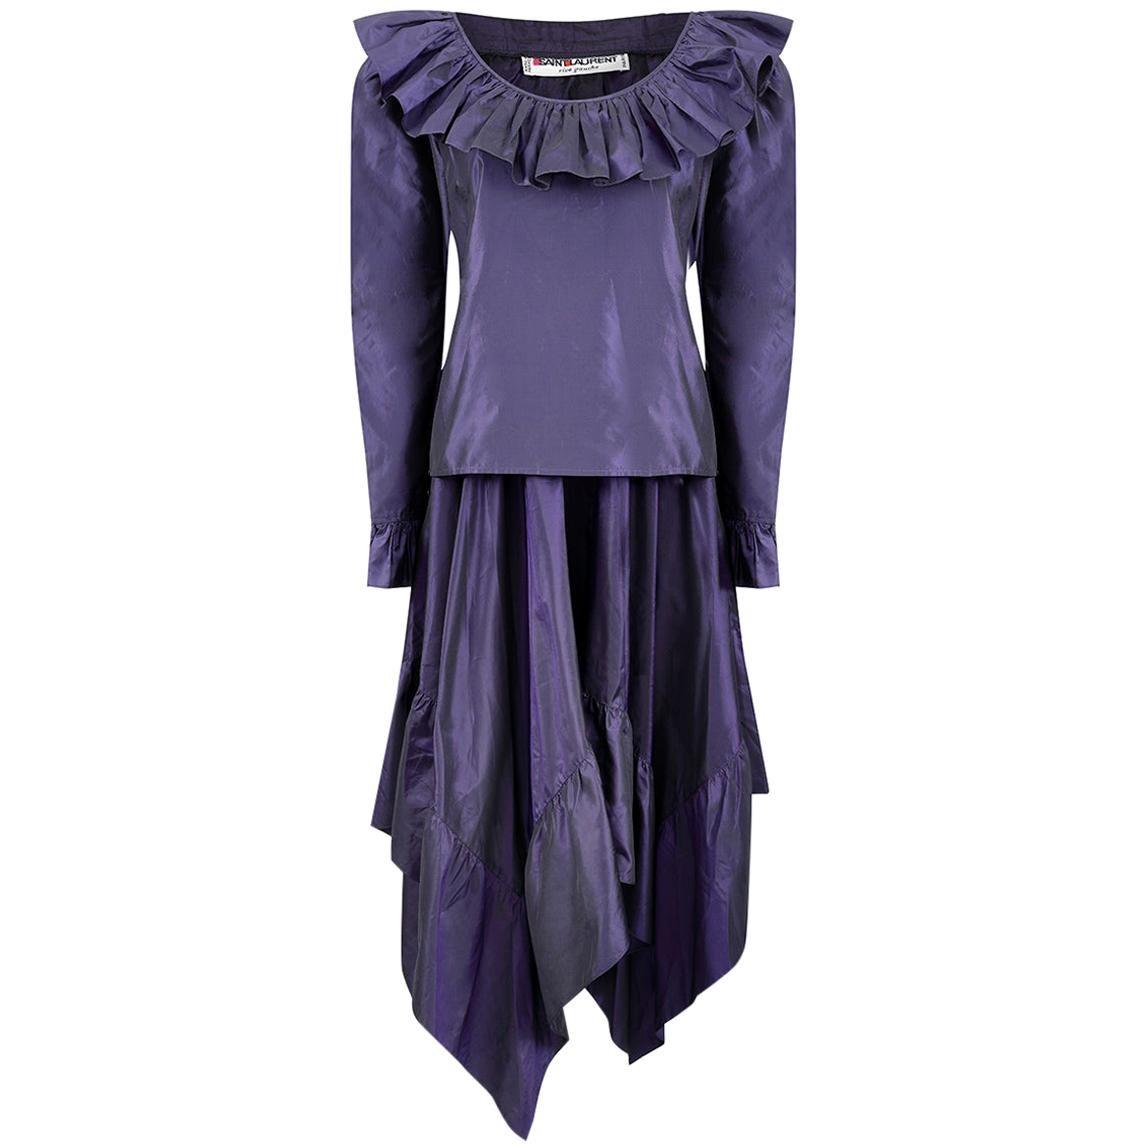 1970s Yves Saint Laurent Rich Purple Taffeta Ruffle Skirt Set